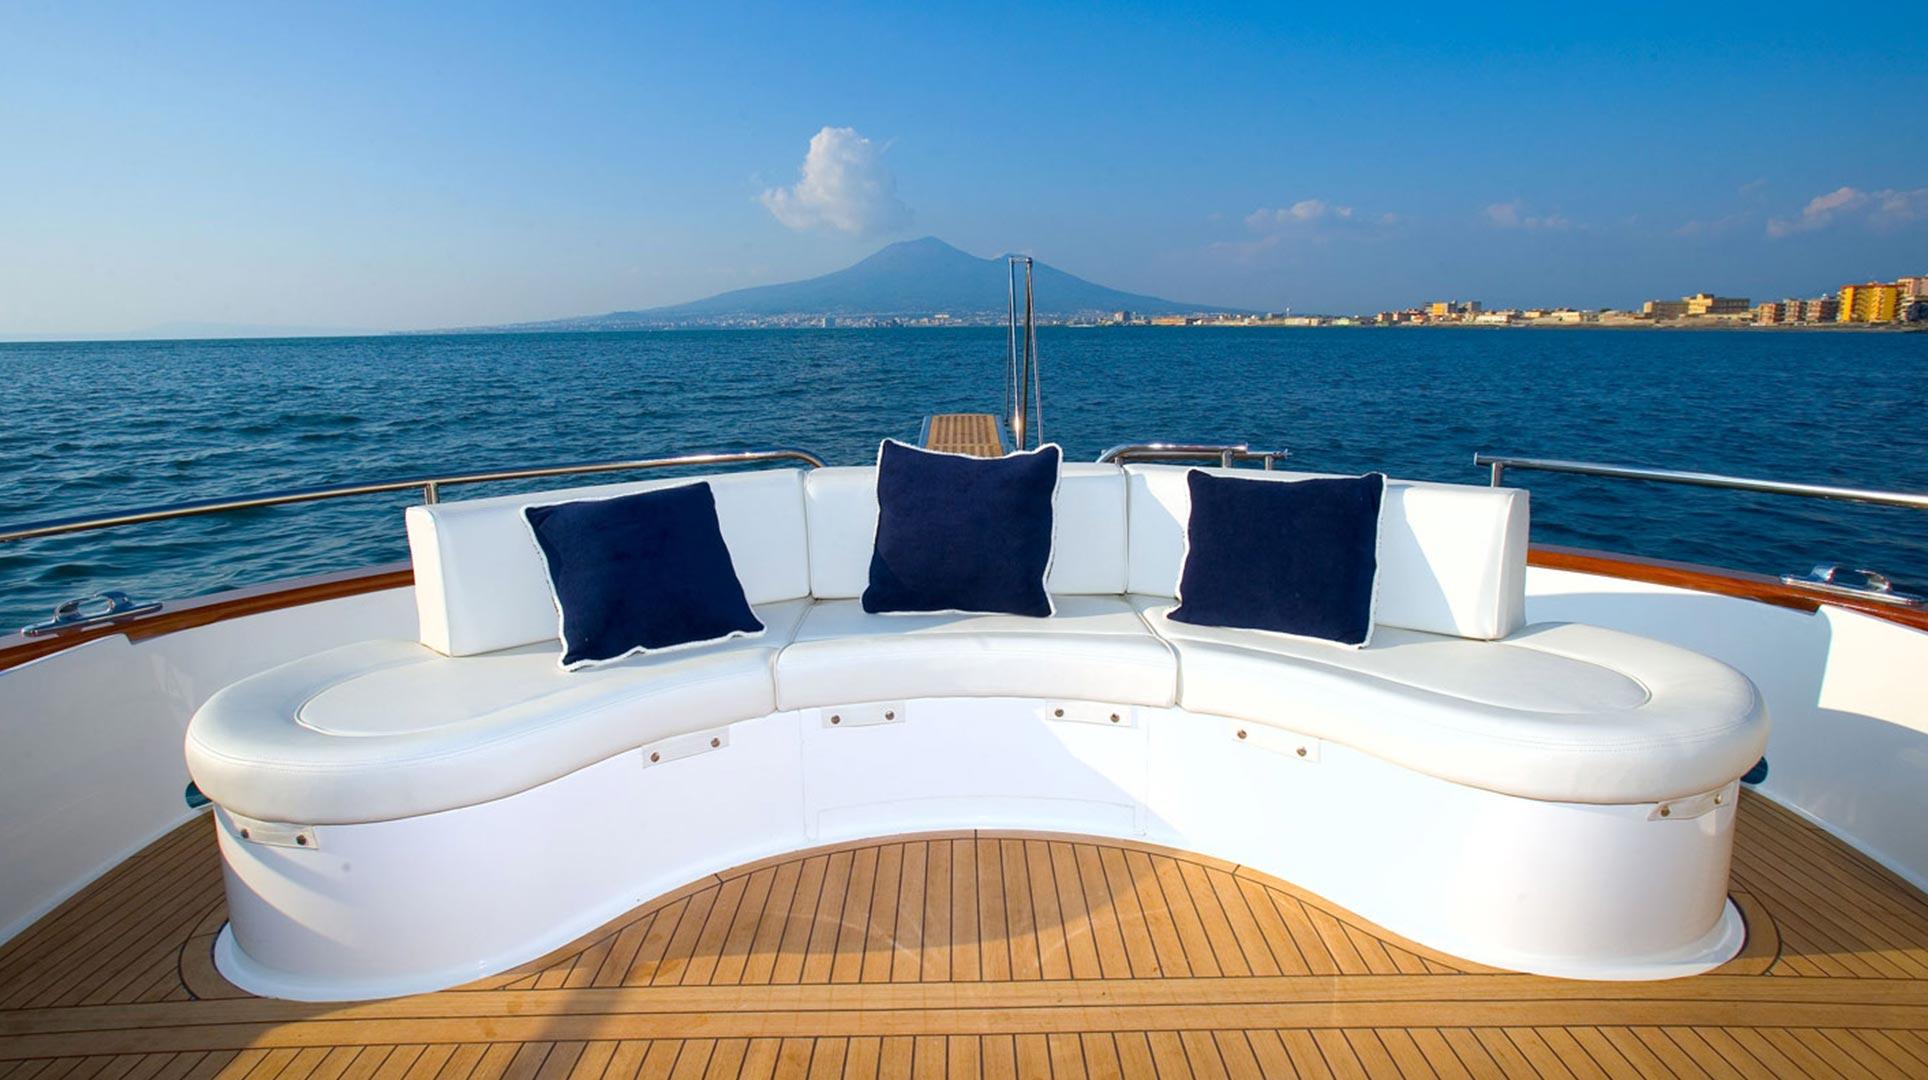 boat-seats-services-san-montano-resort